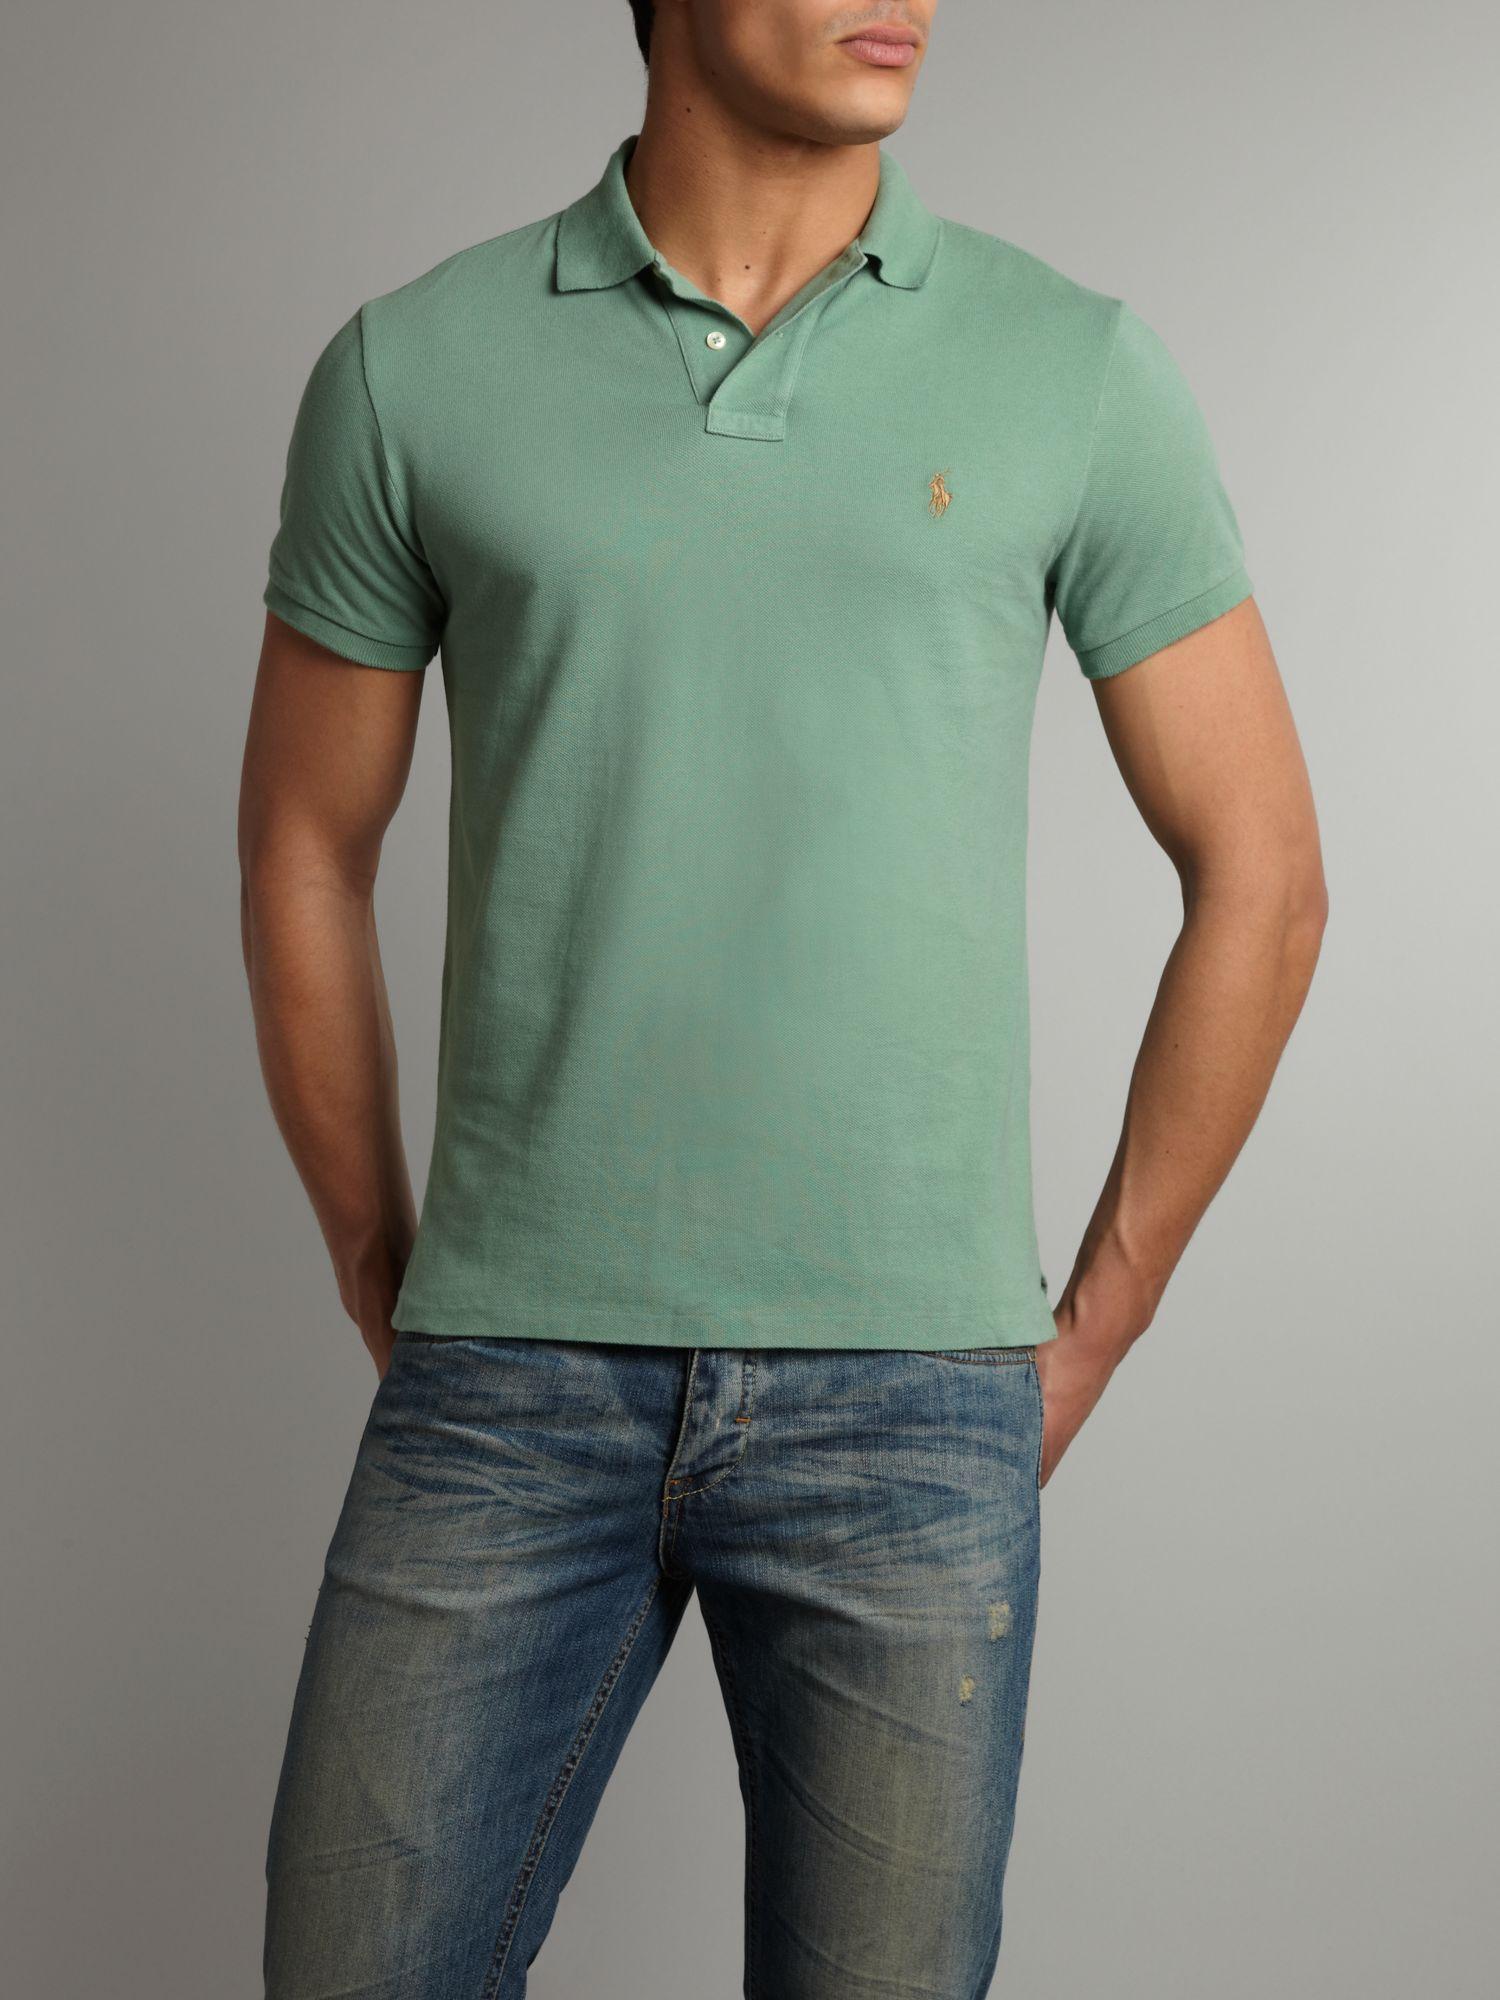 Ralph Lauren Men Custom-Fit Mesh Polo Green